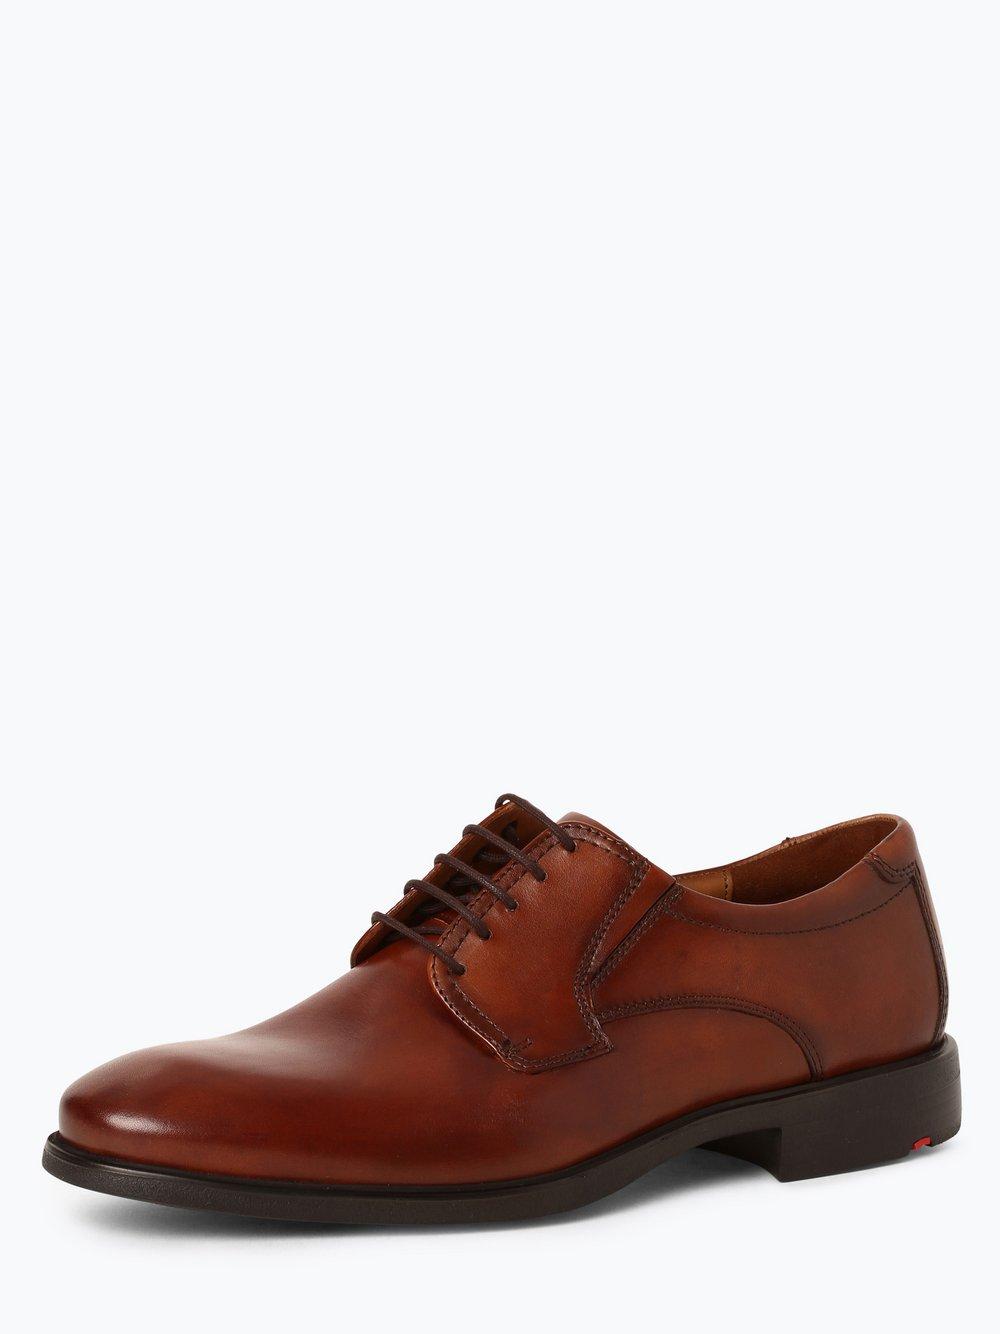 Lloyd – Męskie buty sznurowane ze skóry – Kentucky, beżowy Van Graaf 429362-0001-00105